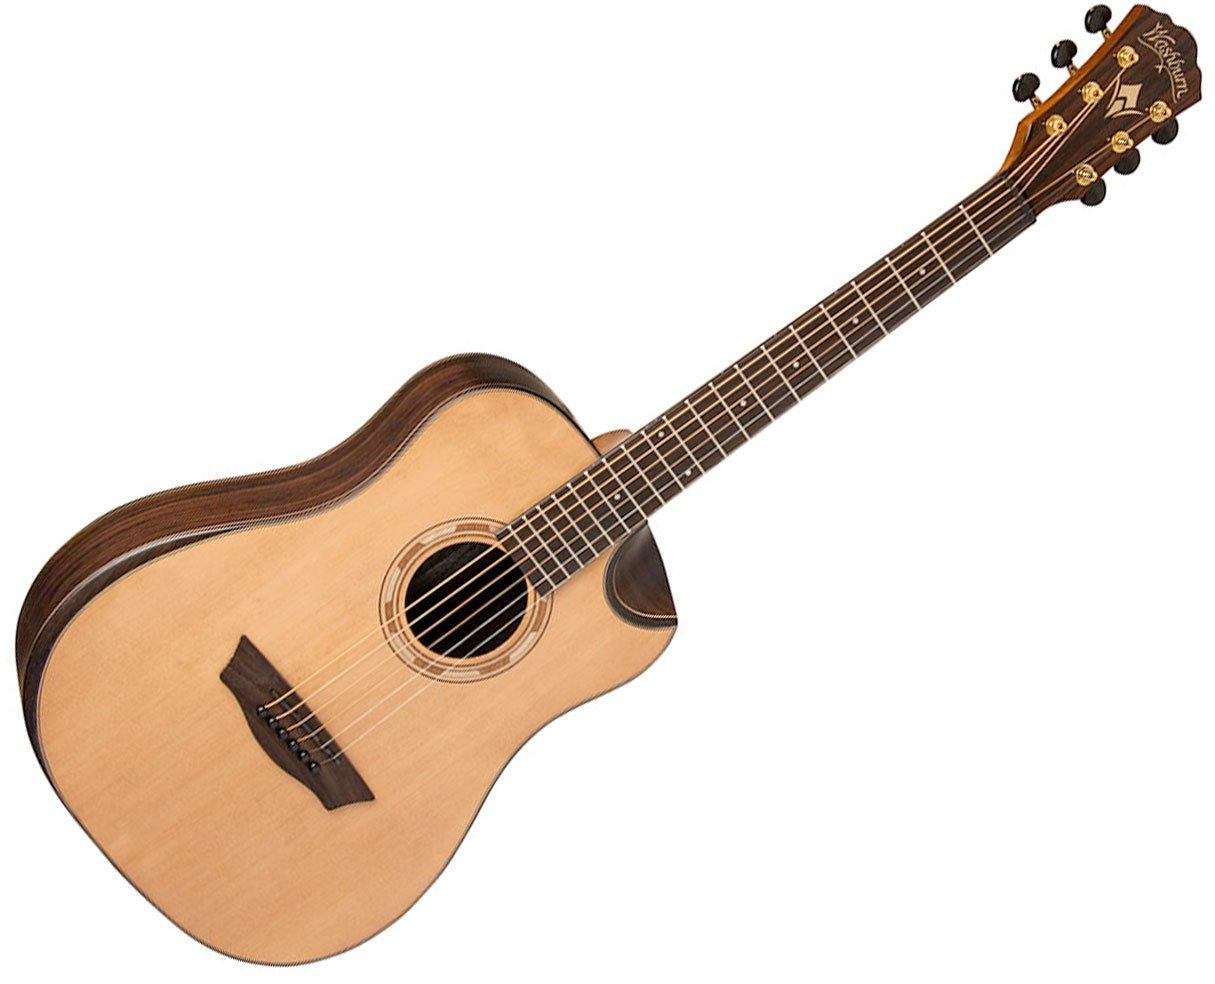 Washburn ワッシュバーン WCDM25SK Comfort Series Dreadnought 6弦 アコースティックギター - Natural アコースティックギター アコギ ギター (並行輸入) B00XCW9SEM